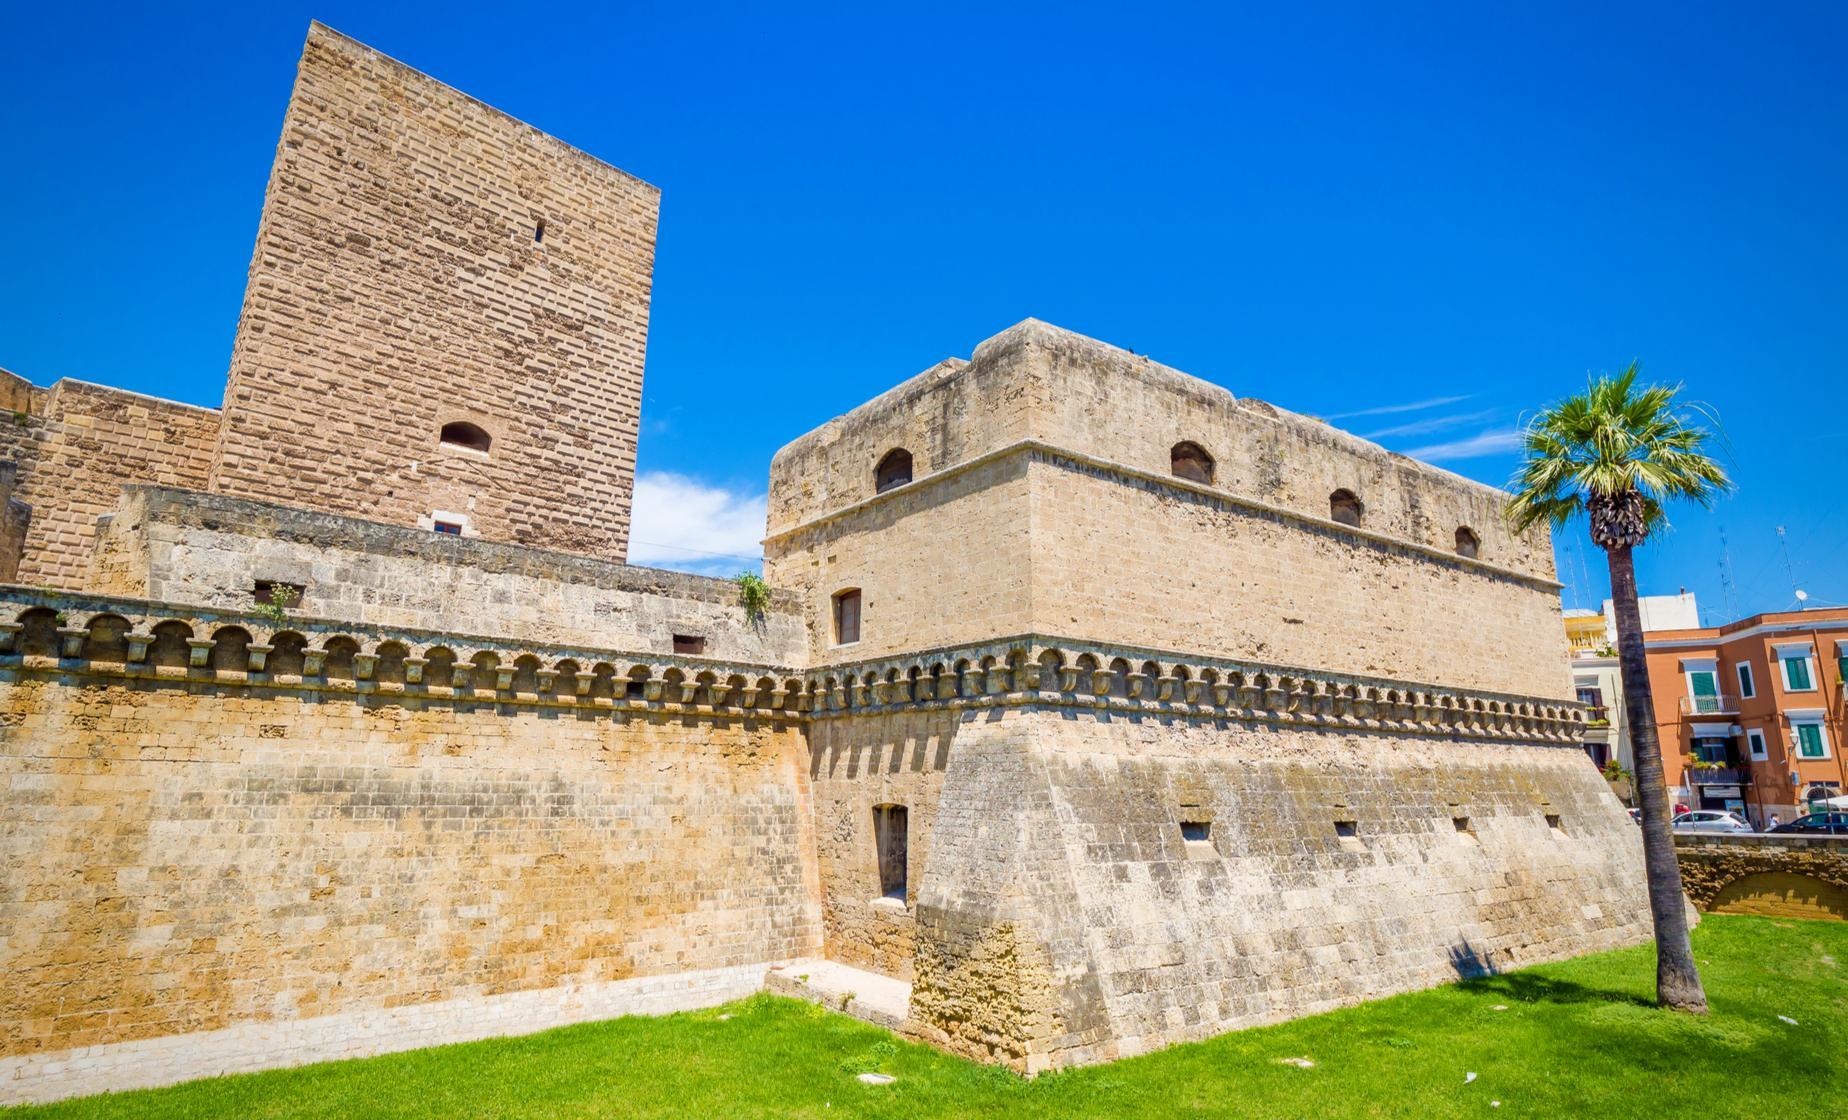 Historical Bari